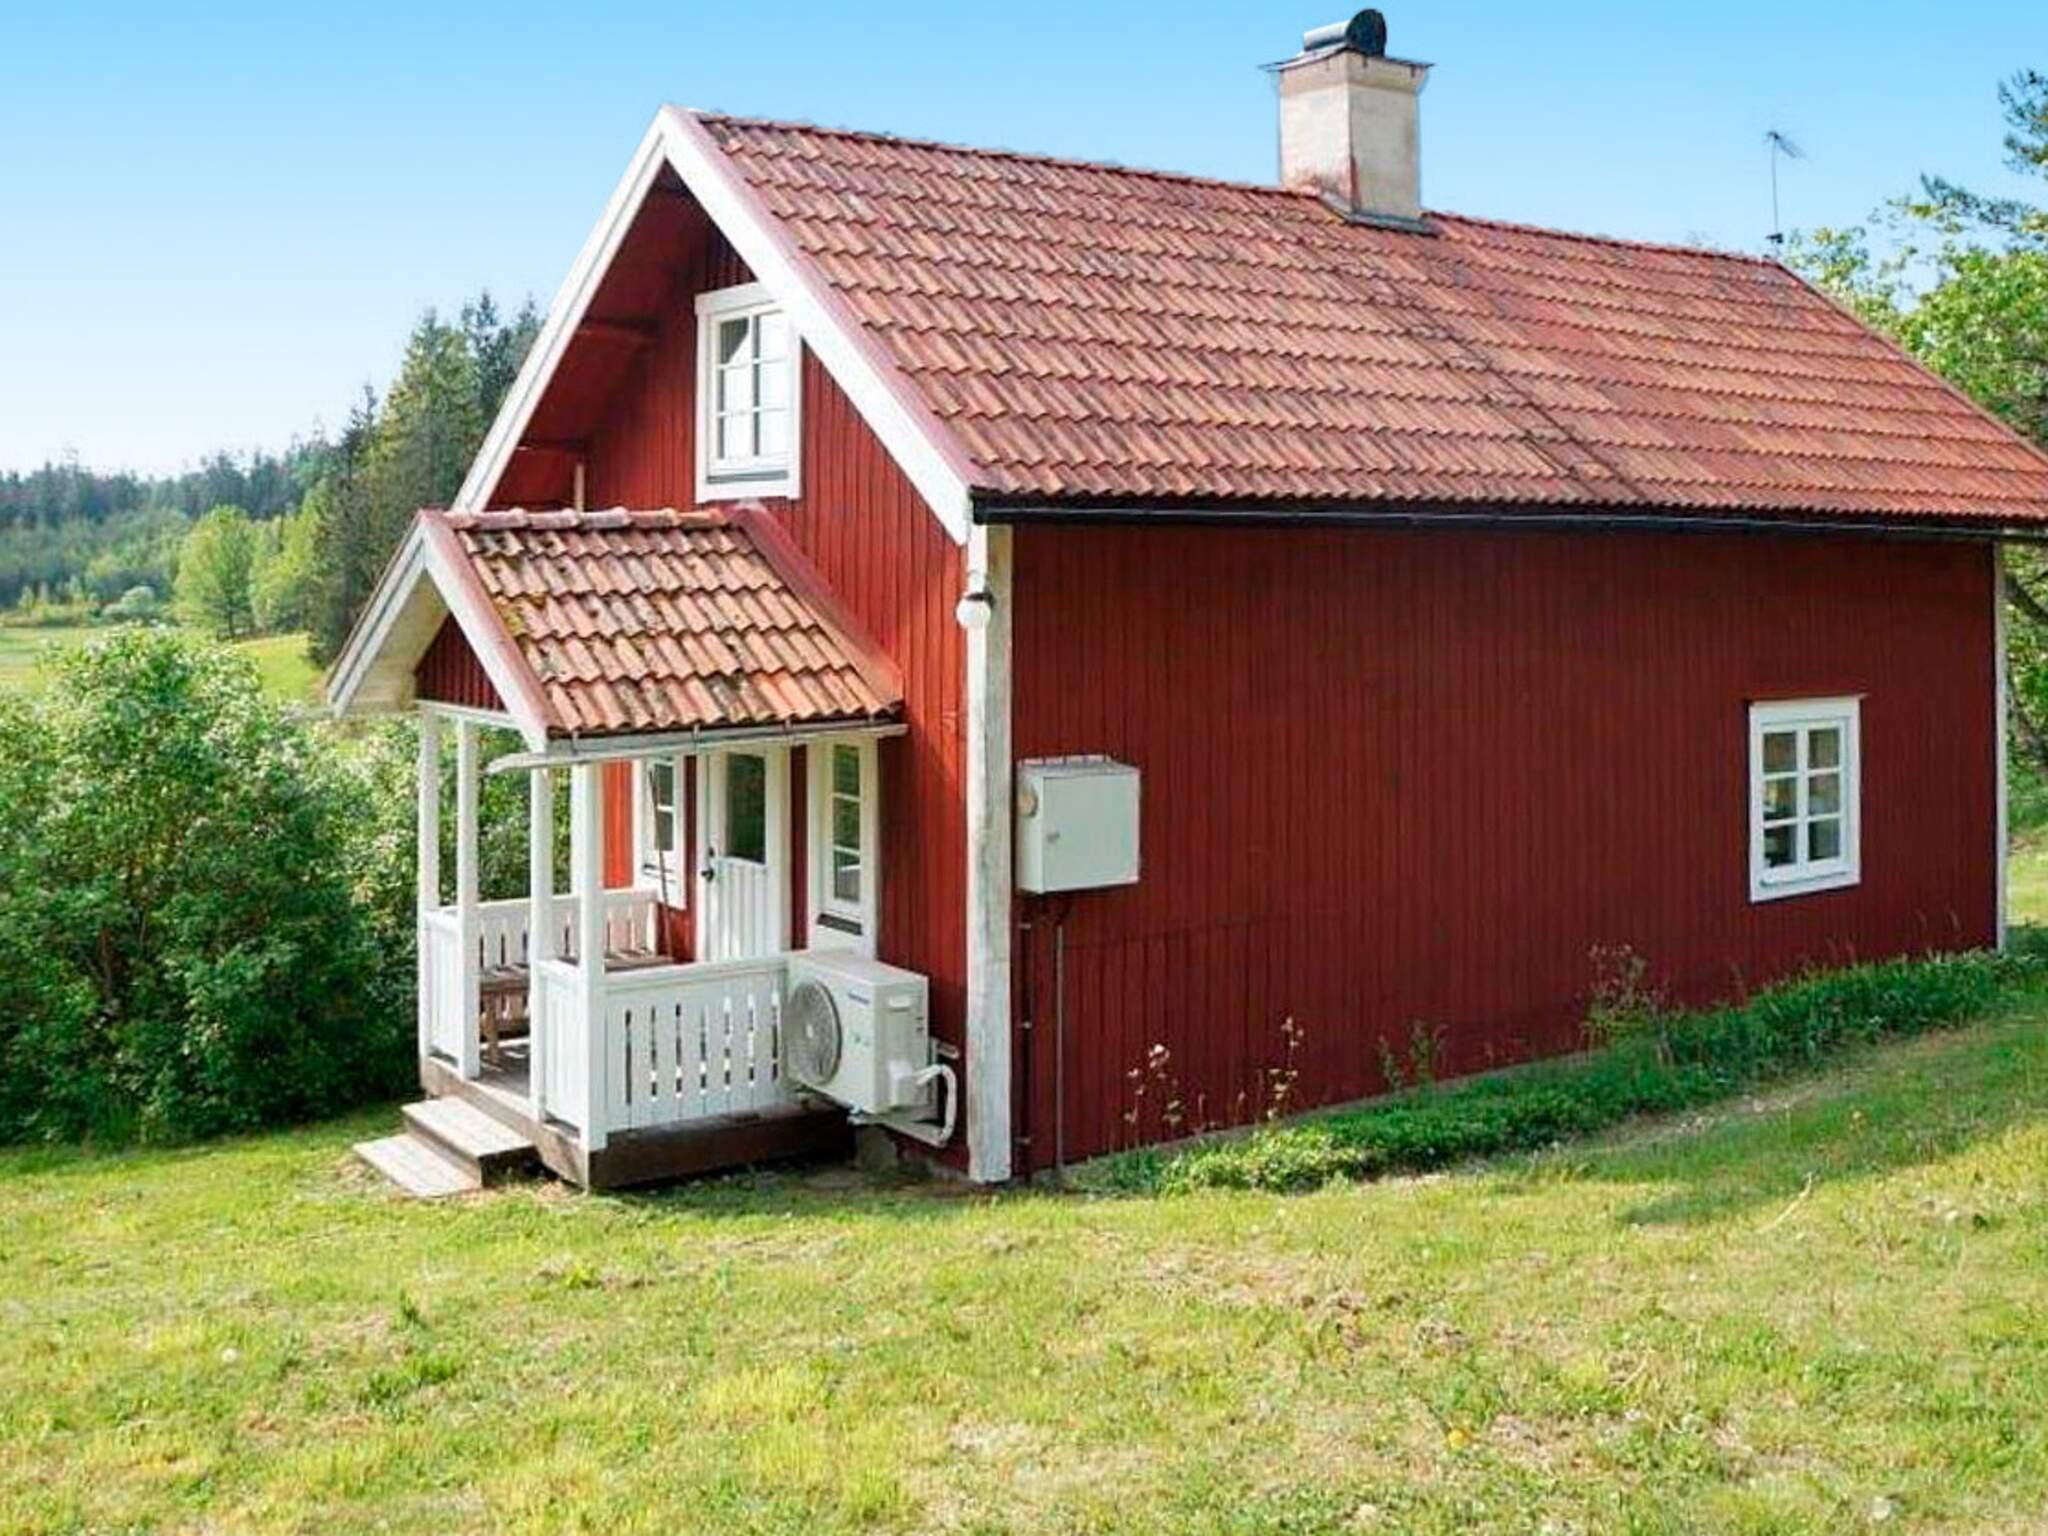 Ferienhaus Valdemarsvik (2634204), Valdemarsvik, Östergötlands län, Südschweden, Schweden, Bild 17